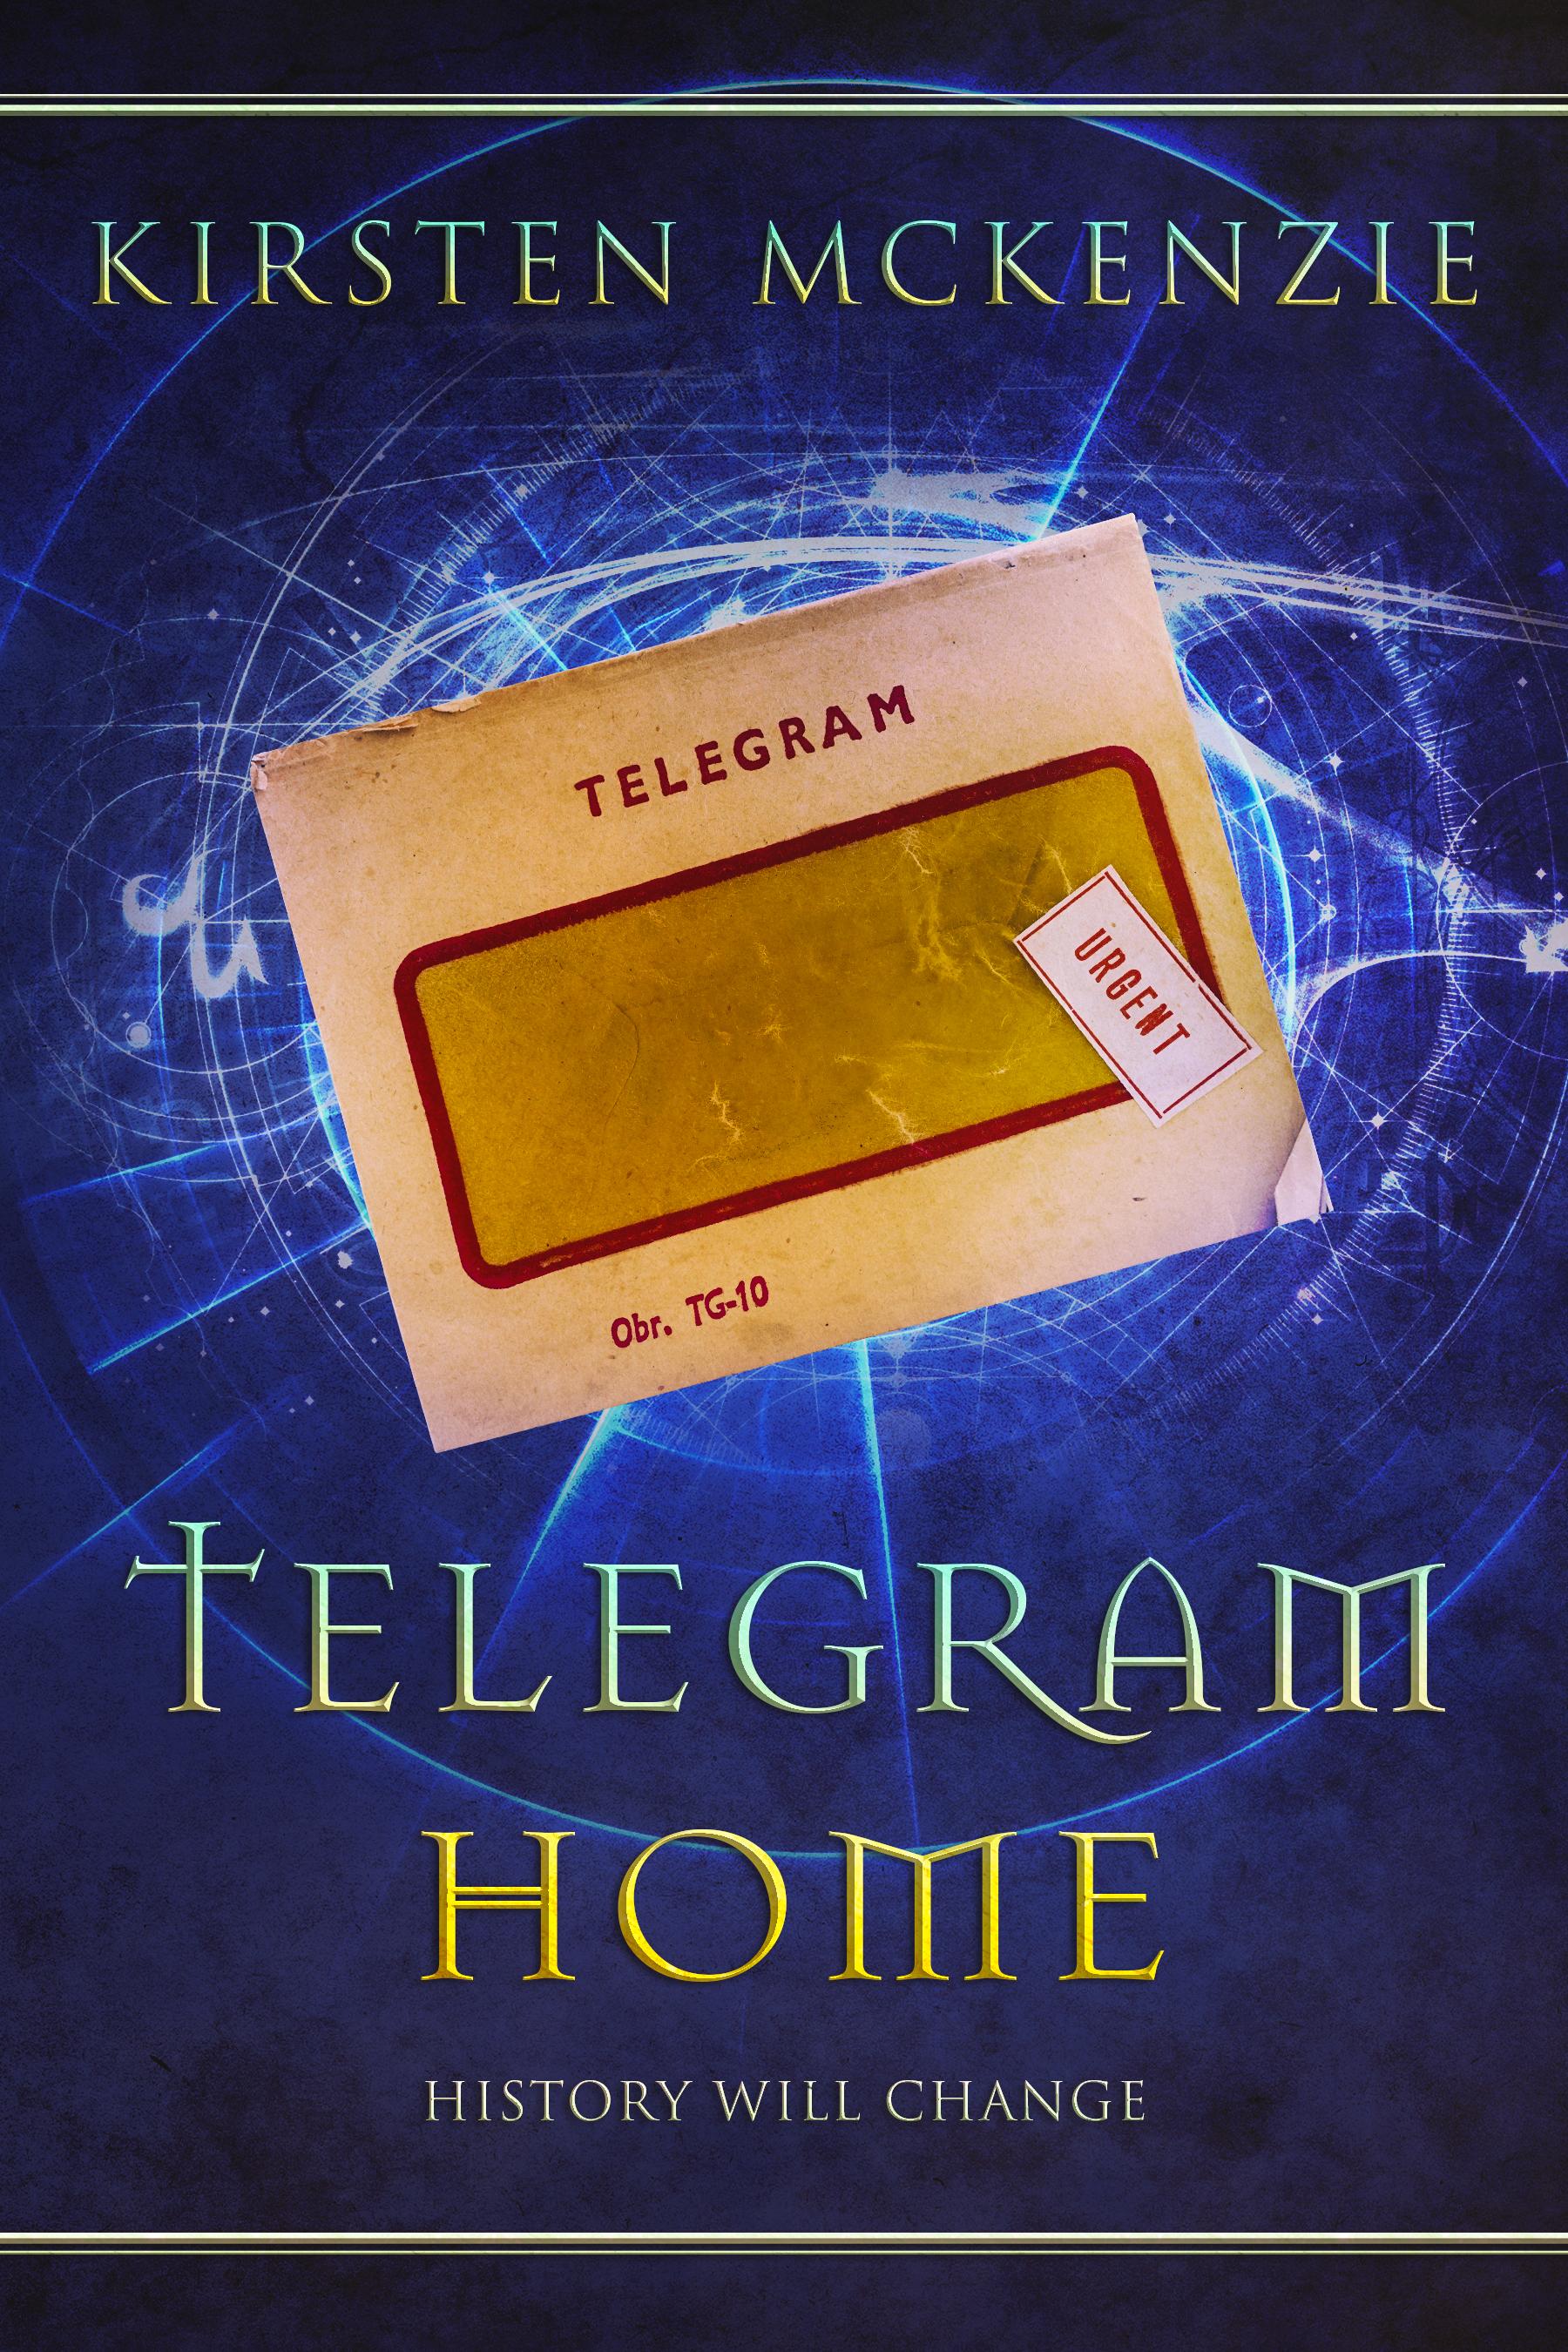 Telegram Home - Book #3 in The Old Curiosity Shop series